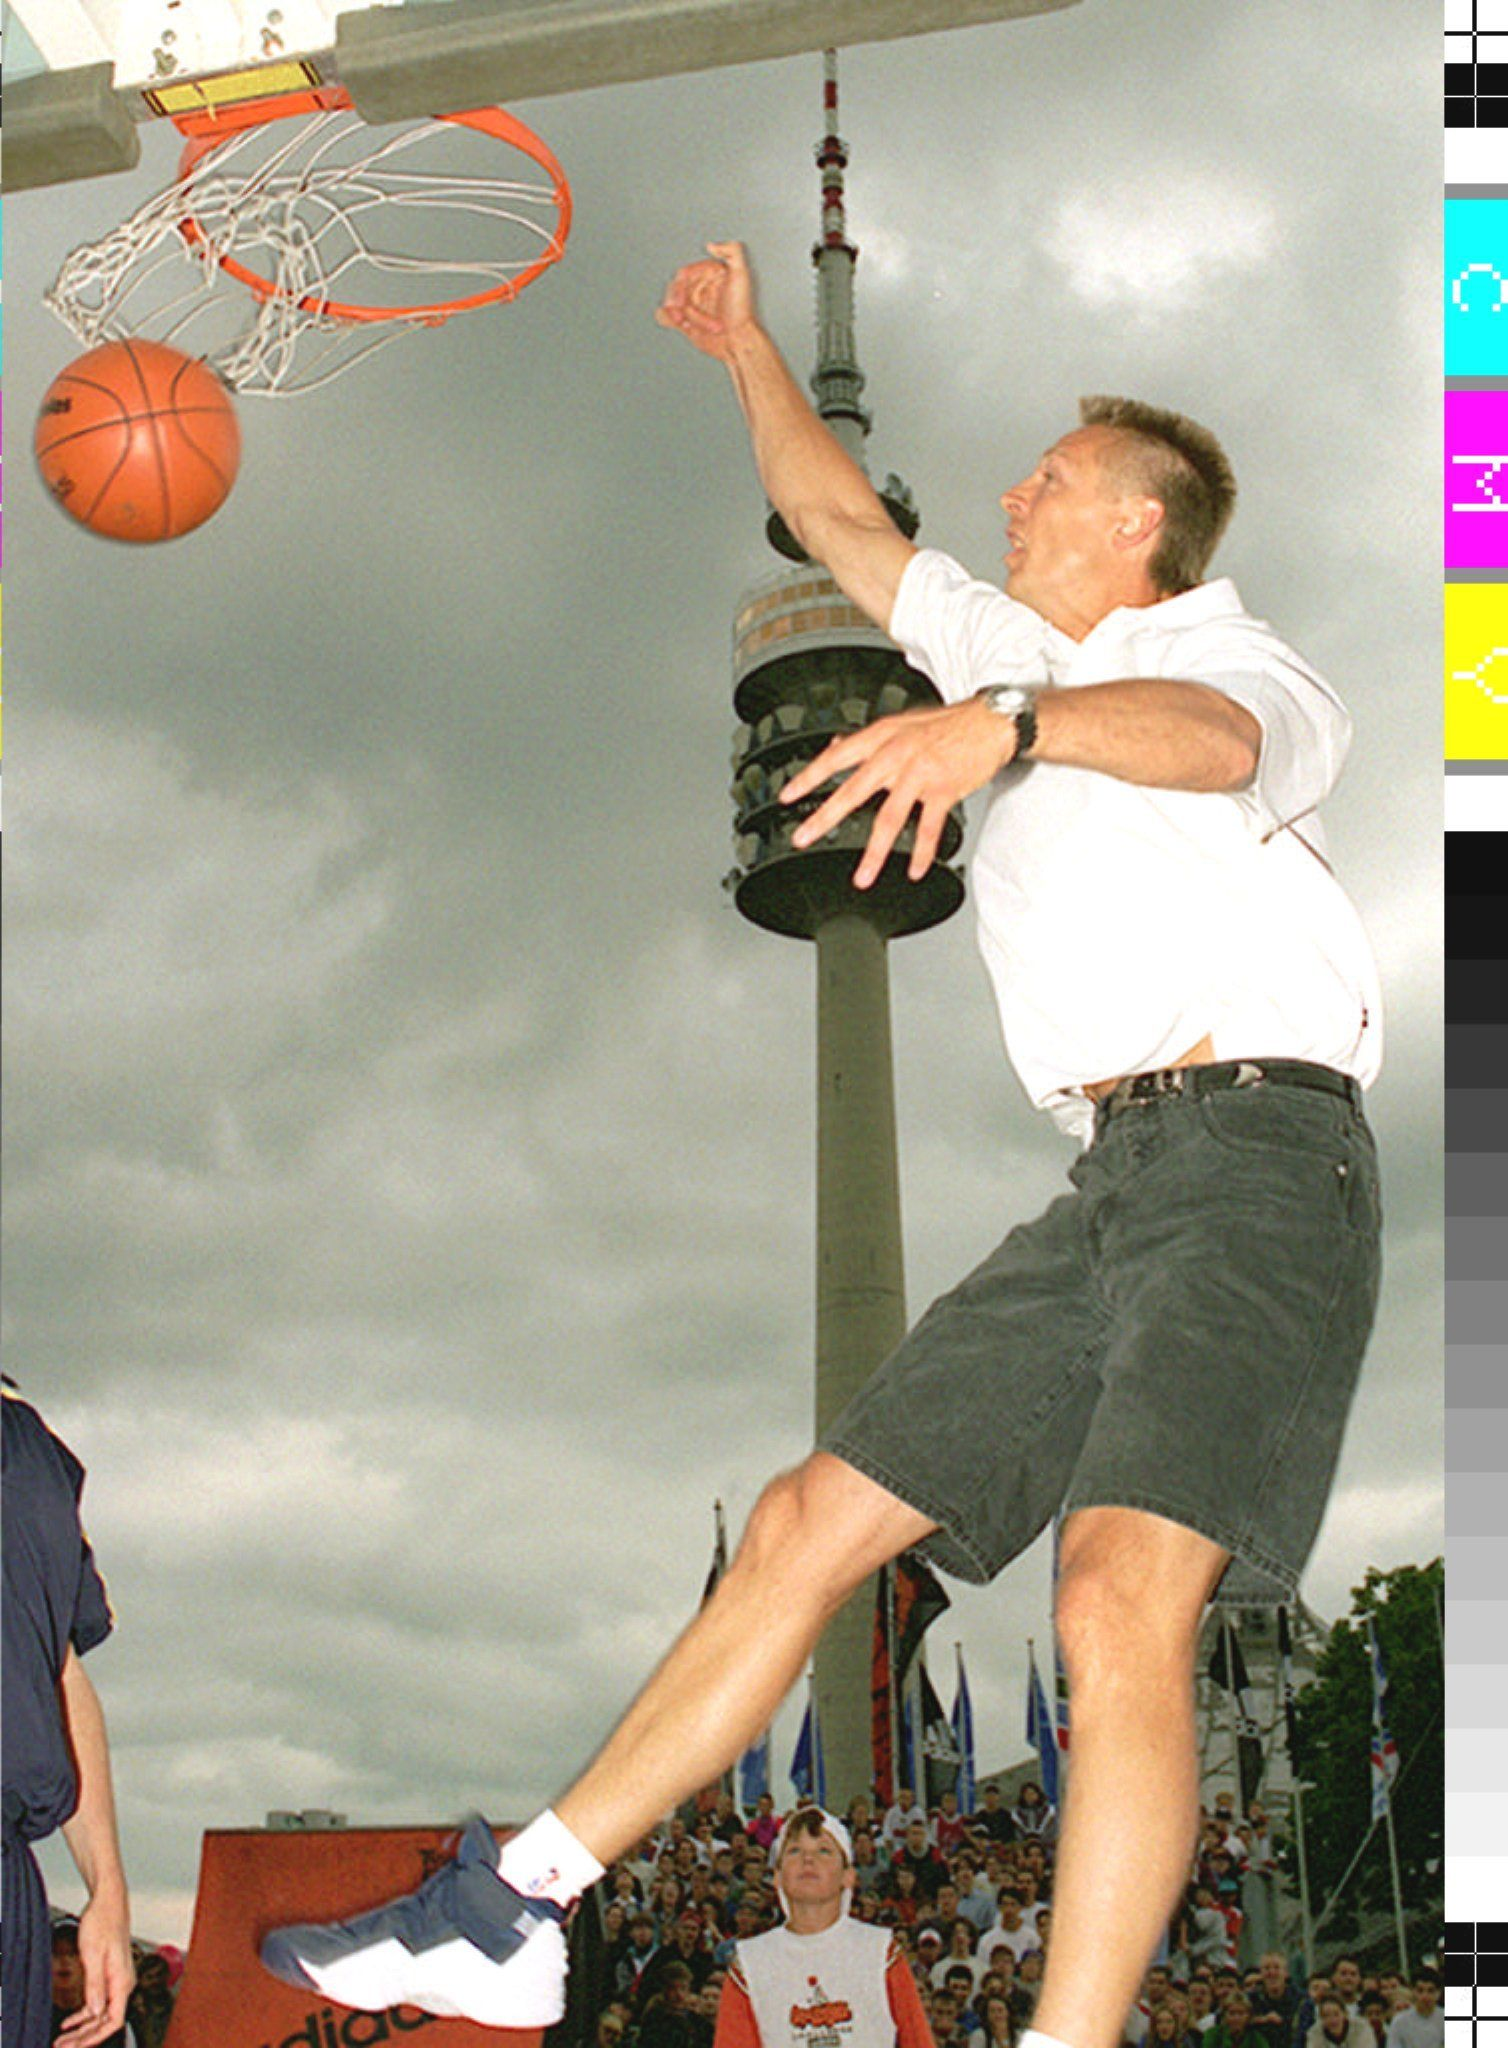 Dirk Nowitzki: Basketball Legende verkündet Karriereende in